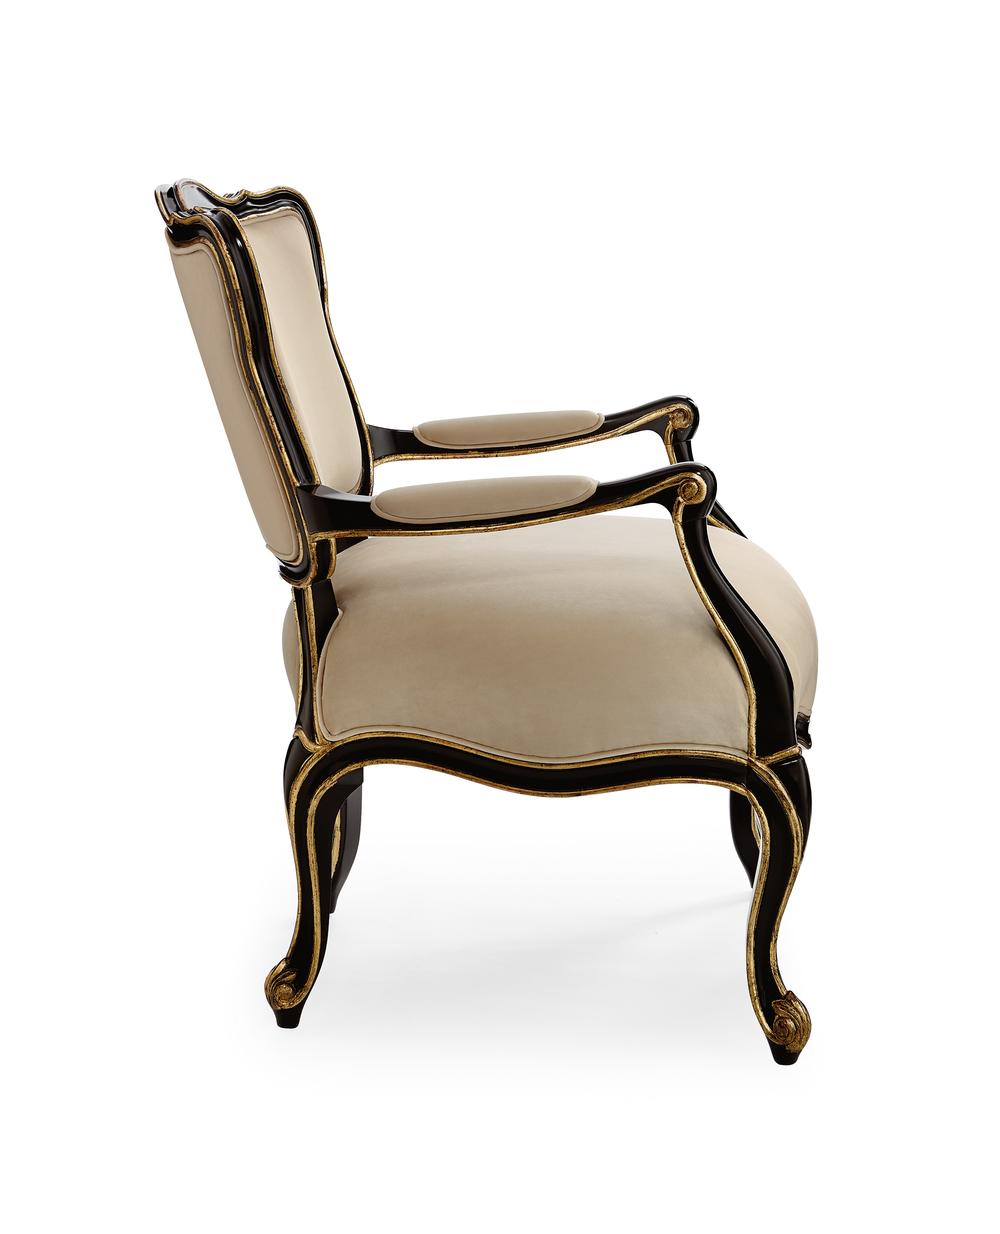 Caracole - The Parisian Chair